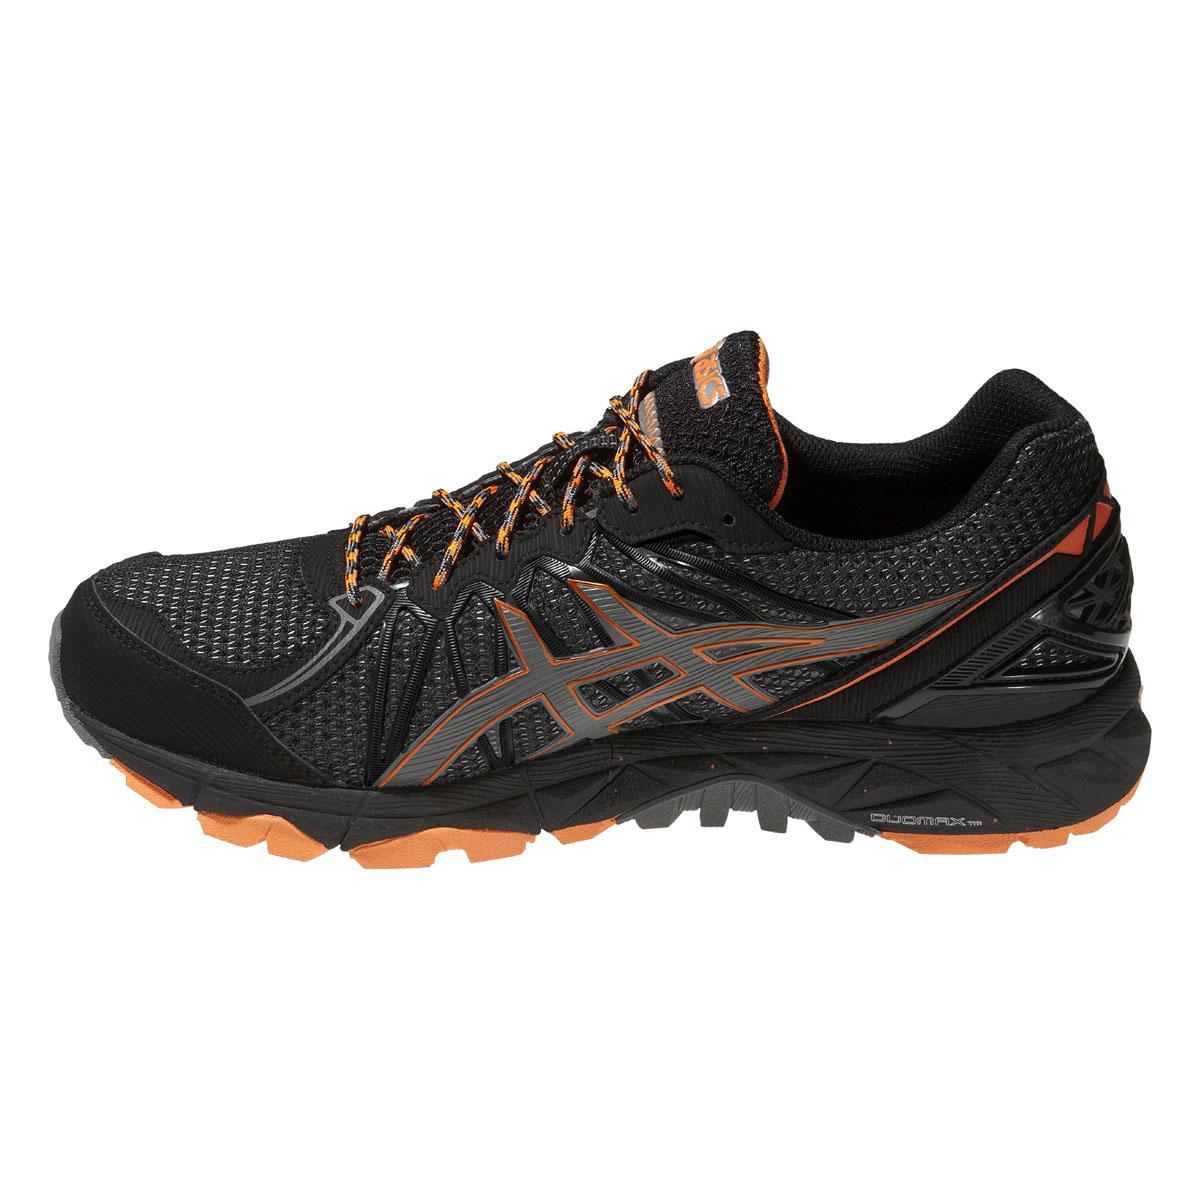 Asics Mens GEL-Fuji Trabuco 3 G-TX Trail Running Shoes